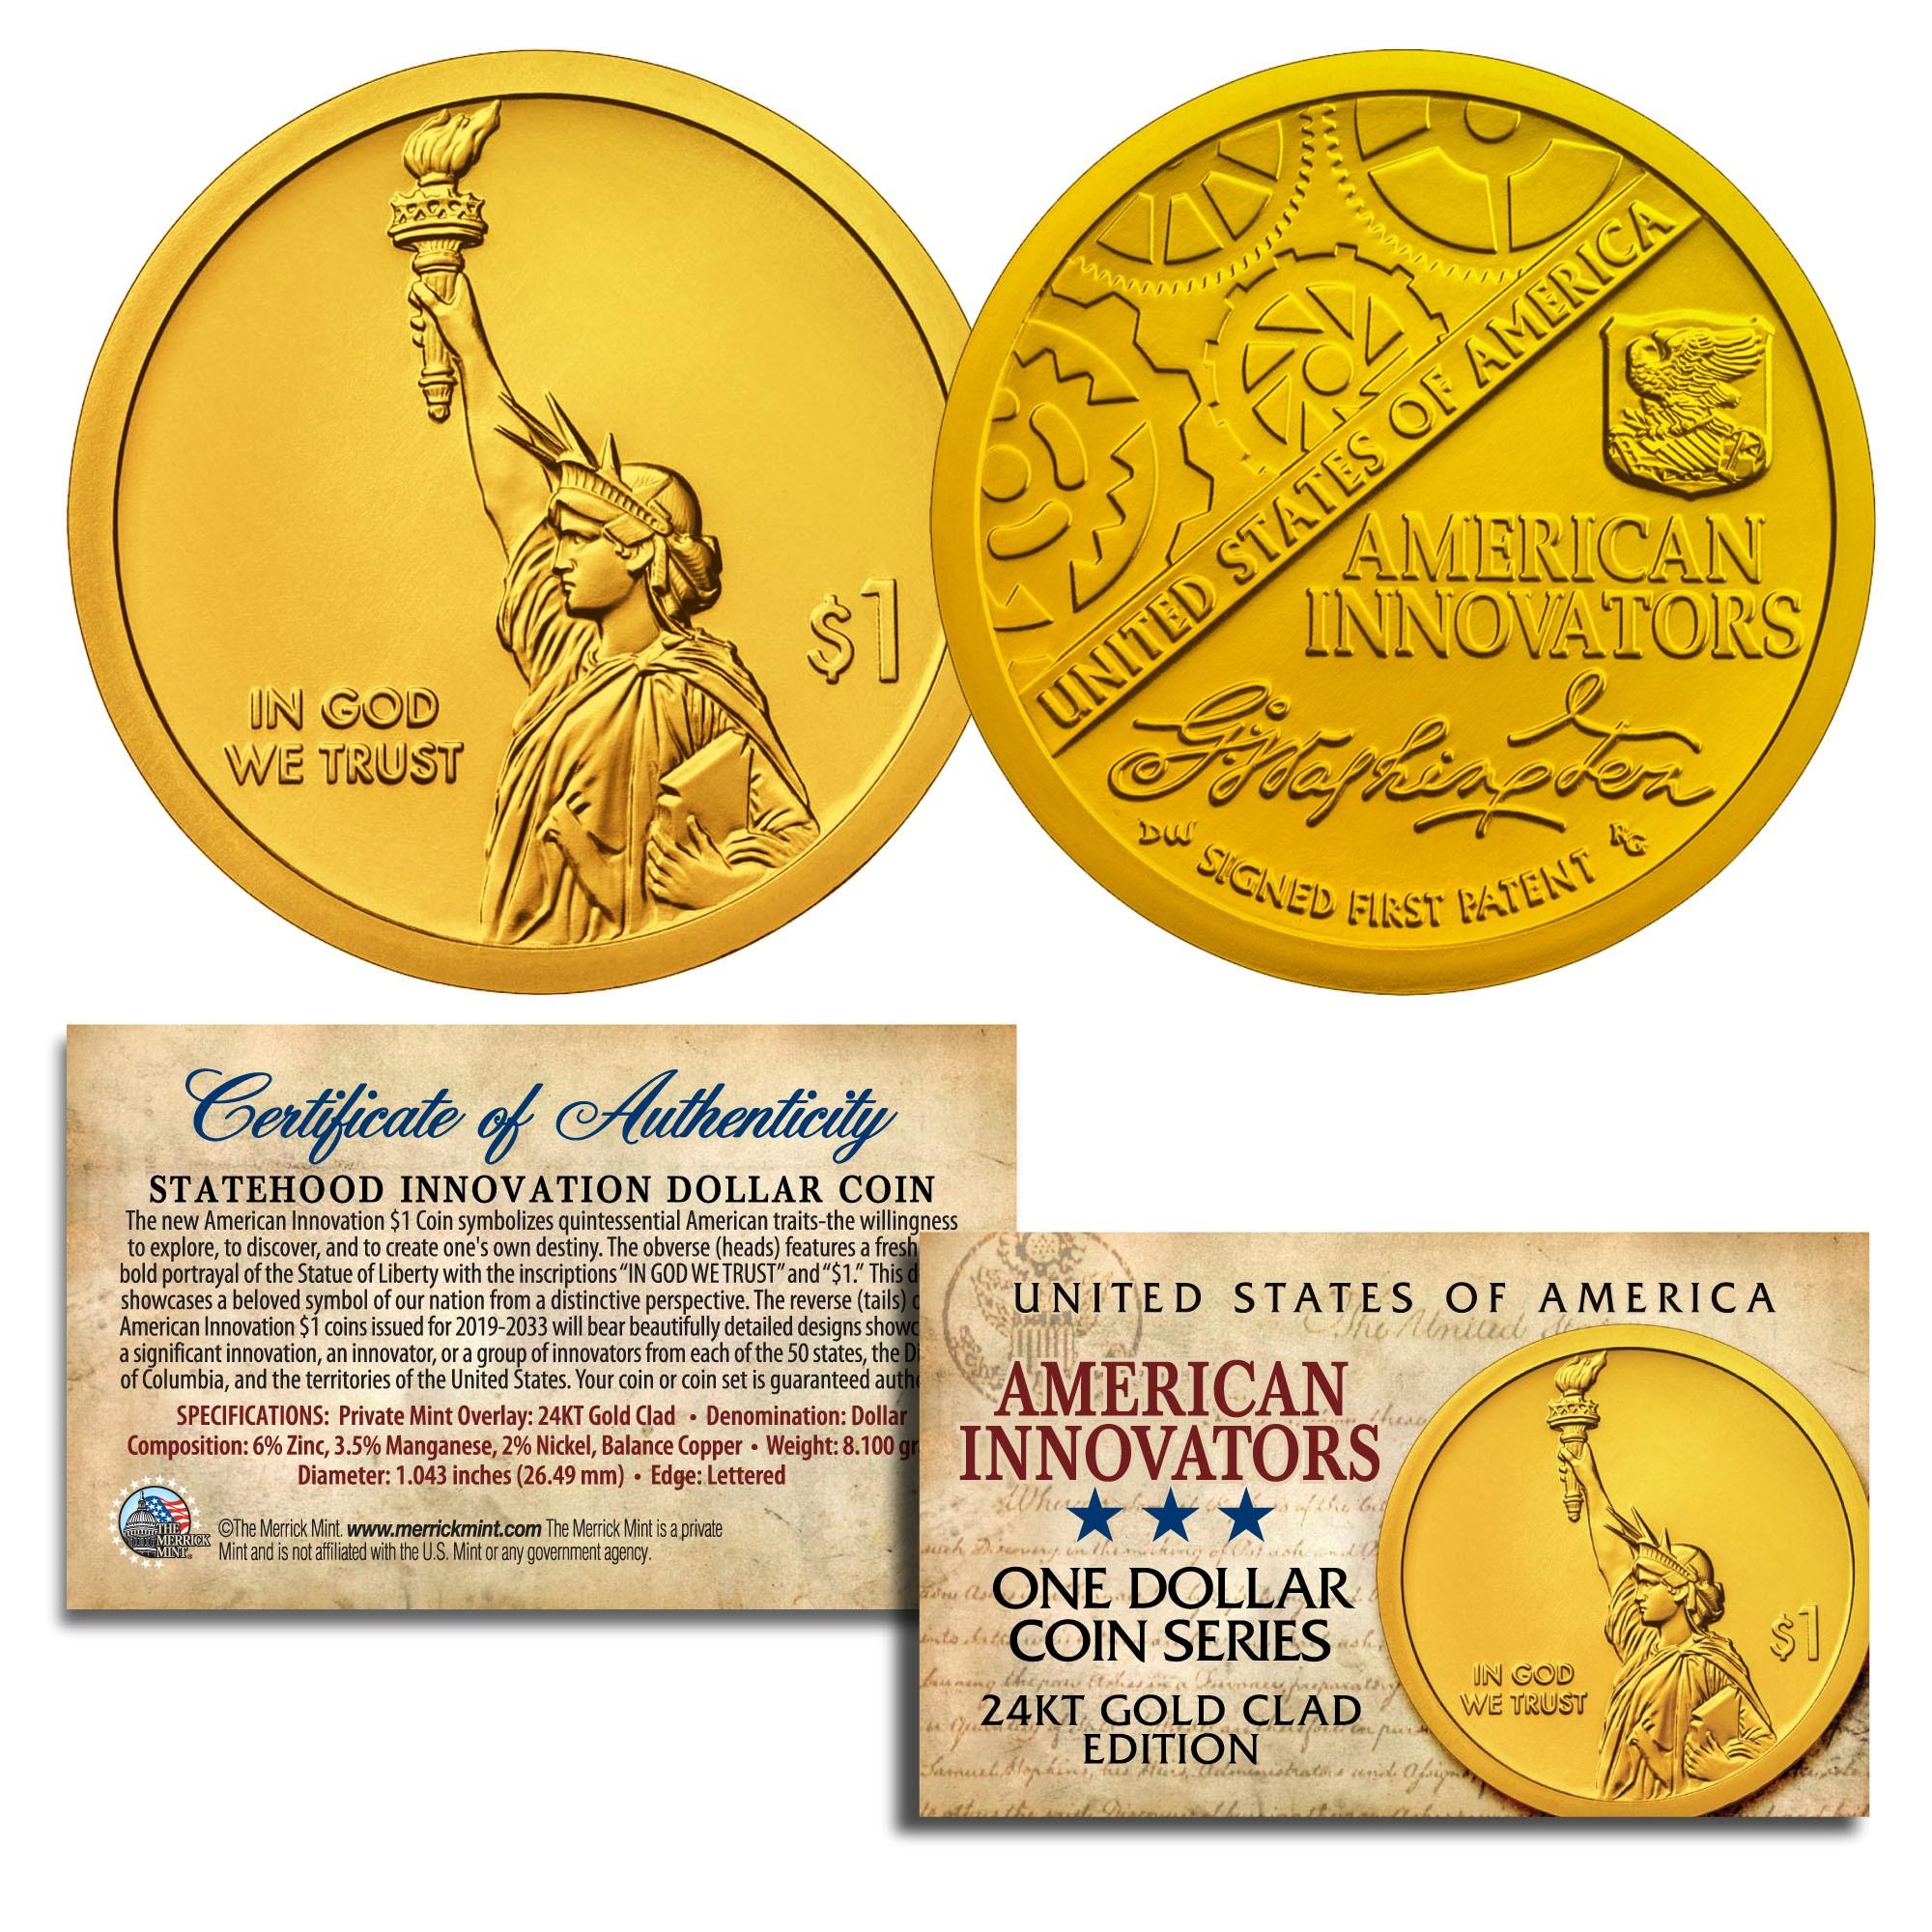 Mint Coins Money 2018 D American Innovation Innovators Golden One Dollars U.S